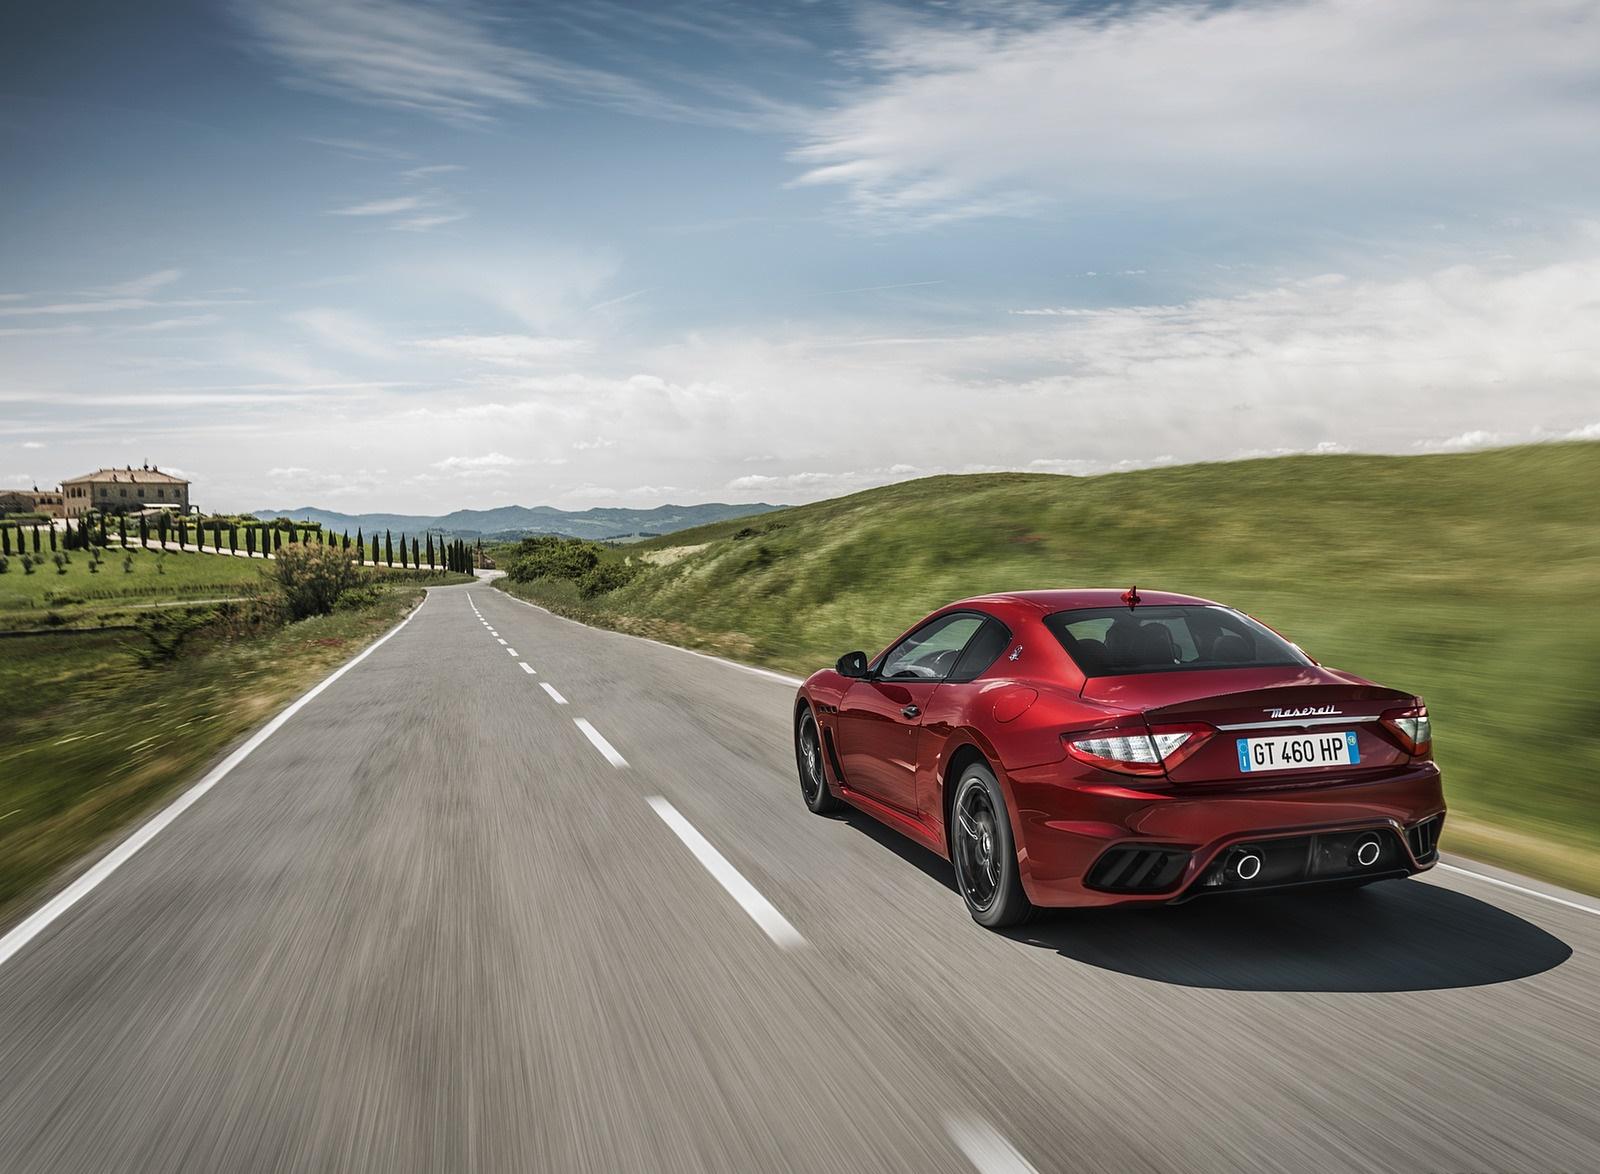 2018 Maserati GranTurismo MC Sport Line Rear Three-Quarter Wallpapers (3)